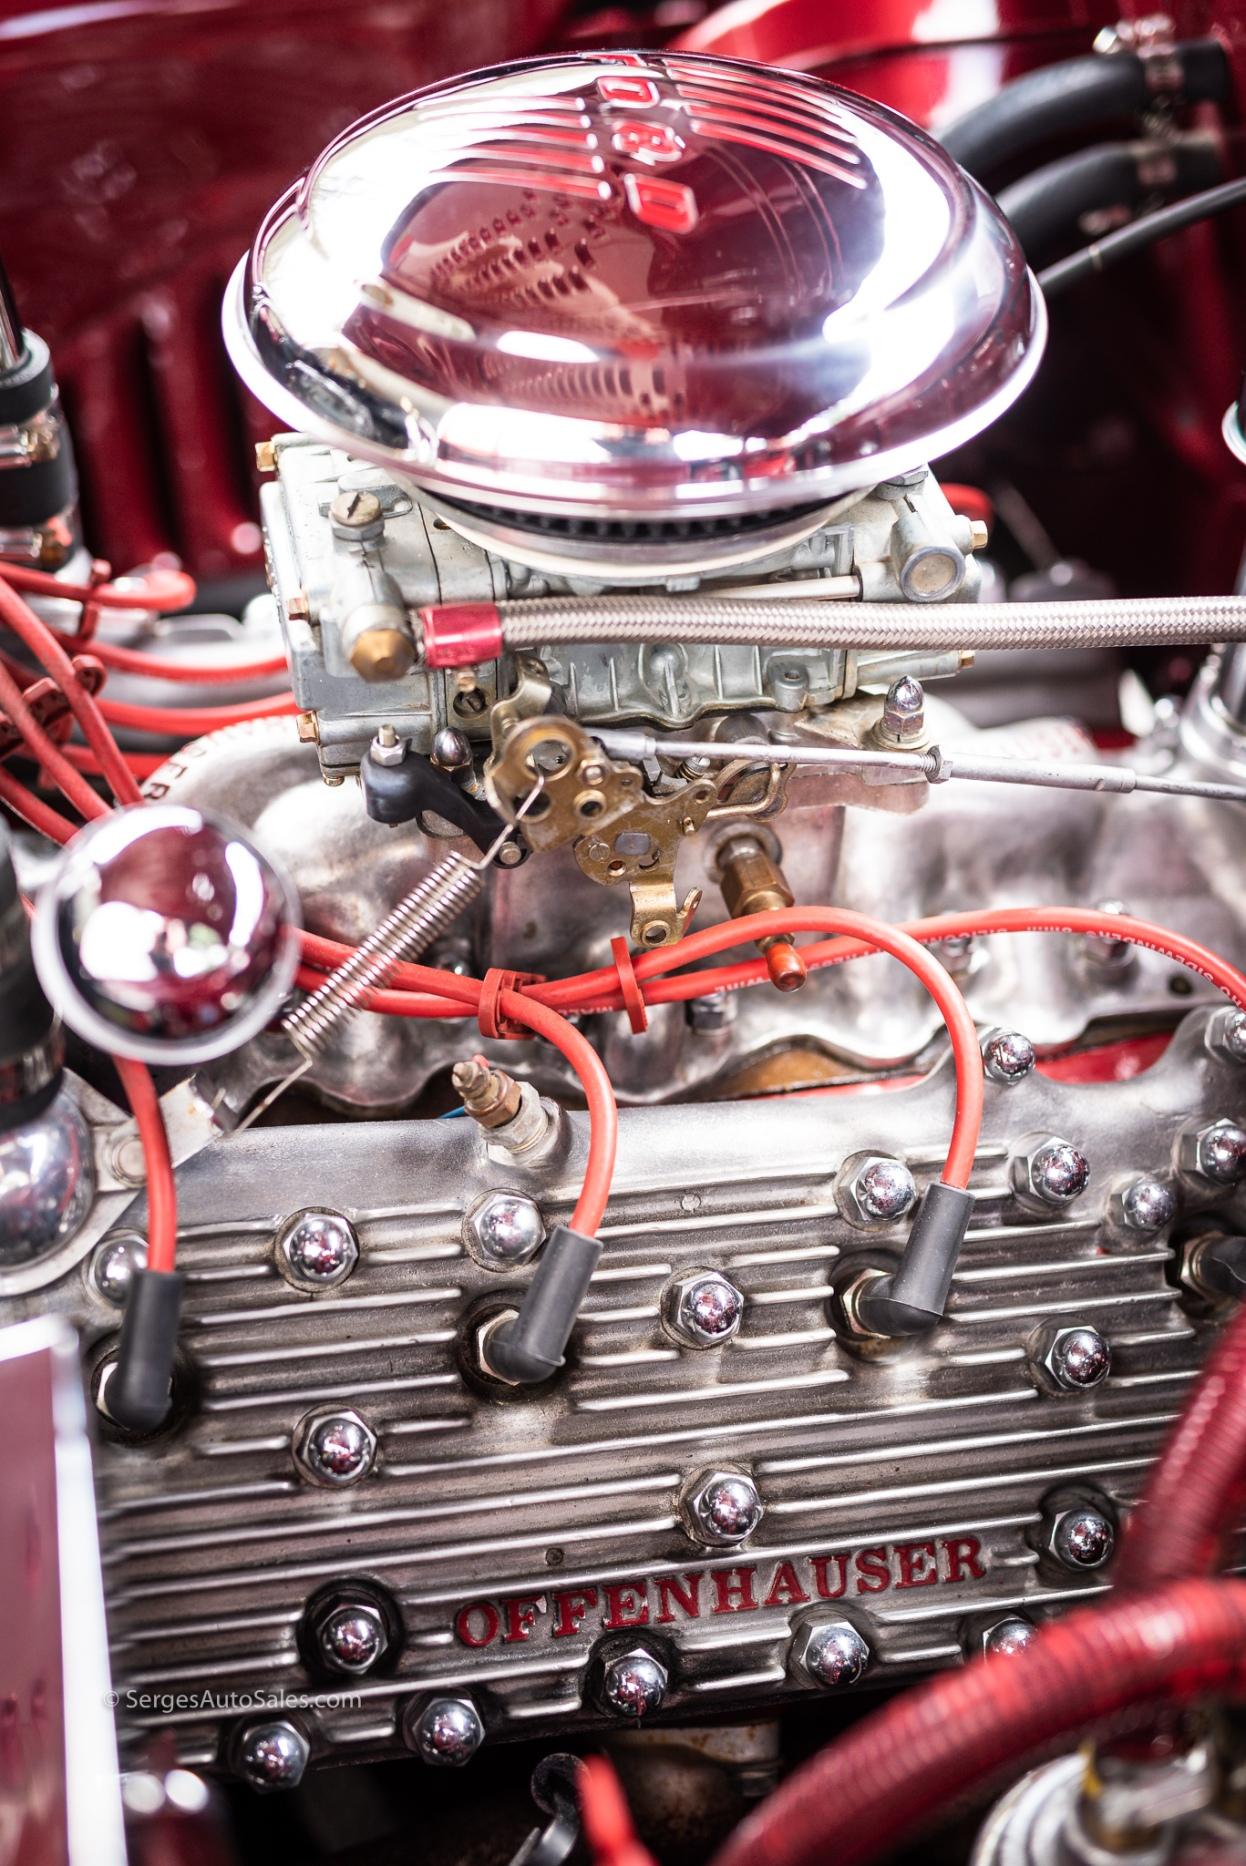 1950-ford-custom-for-sale-serges-auto-sales-pennsylvania-car-dealer-classics-customs-muscle-brokering-81